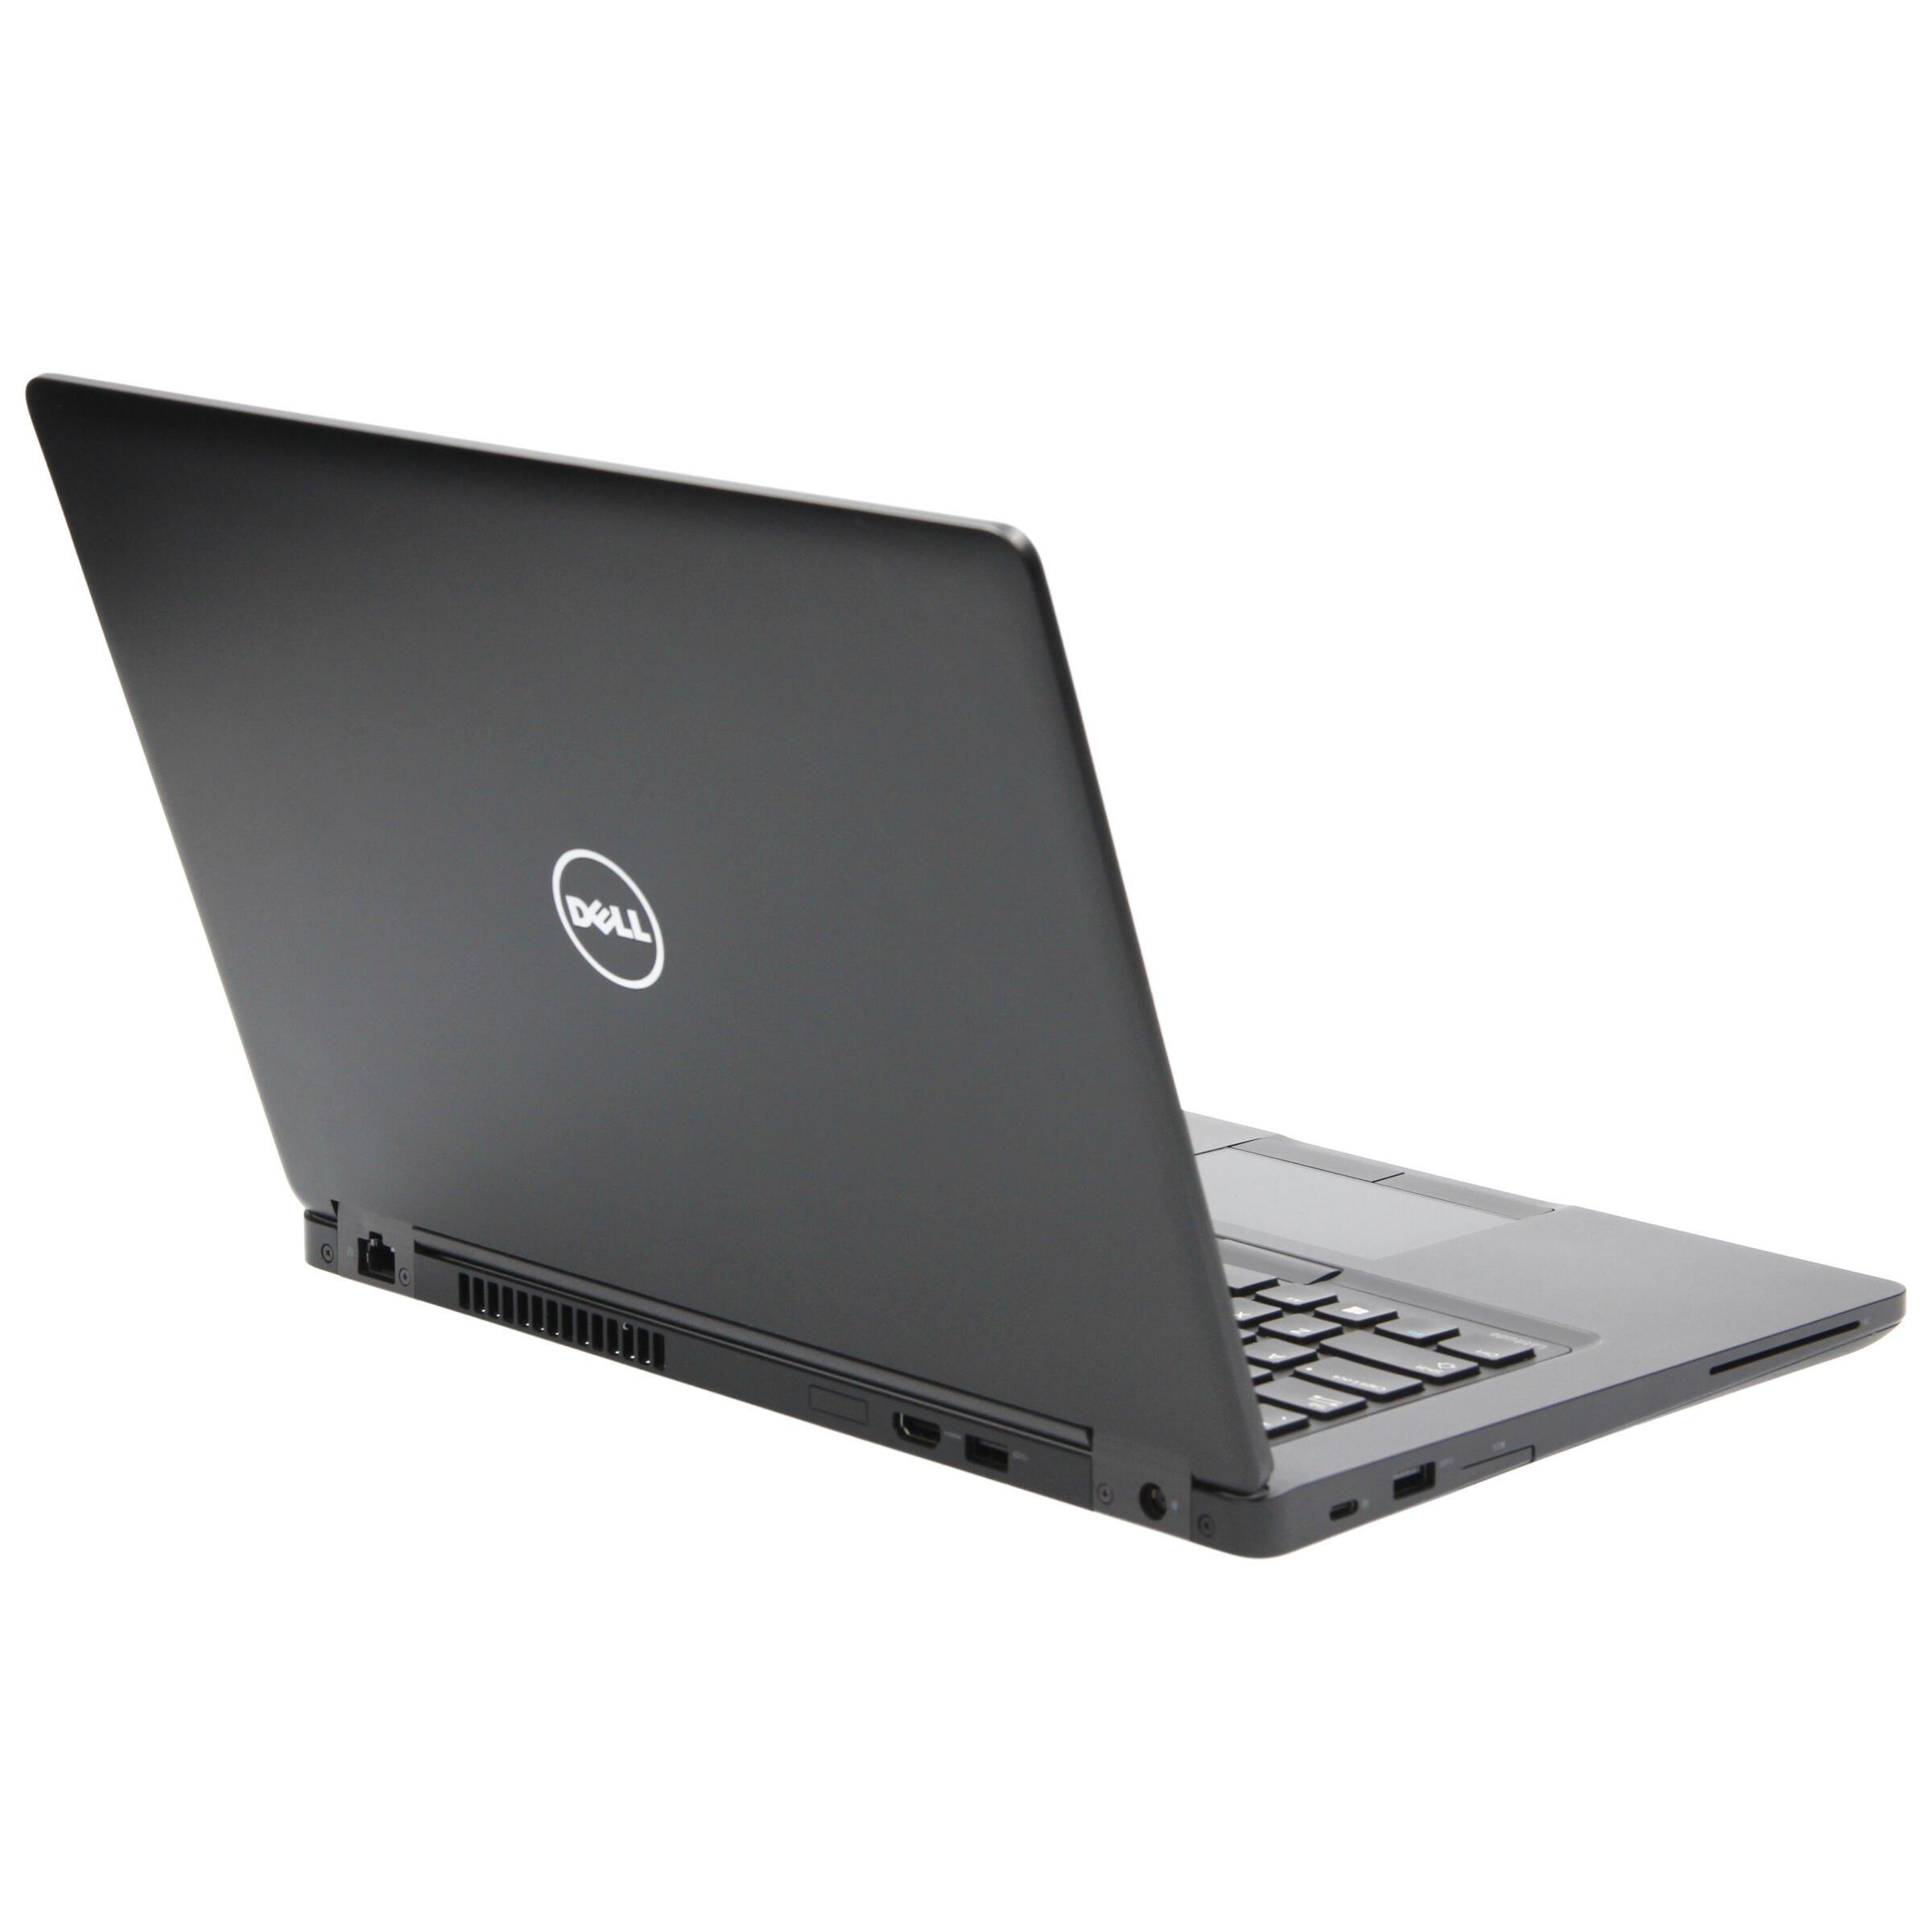 Laptop na prezent komunijny